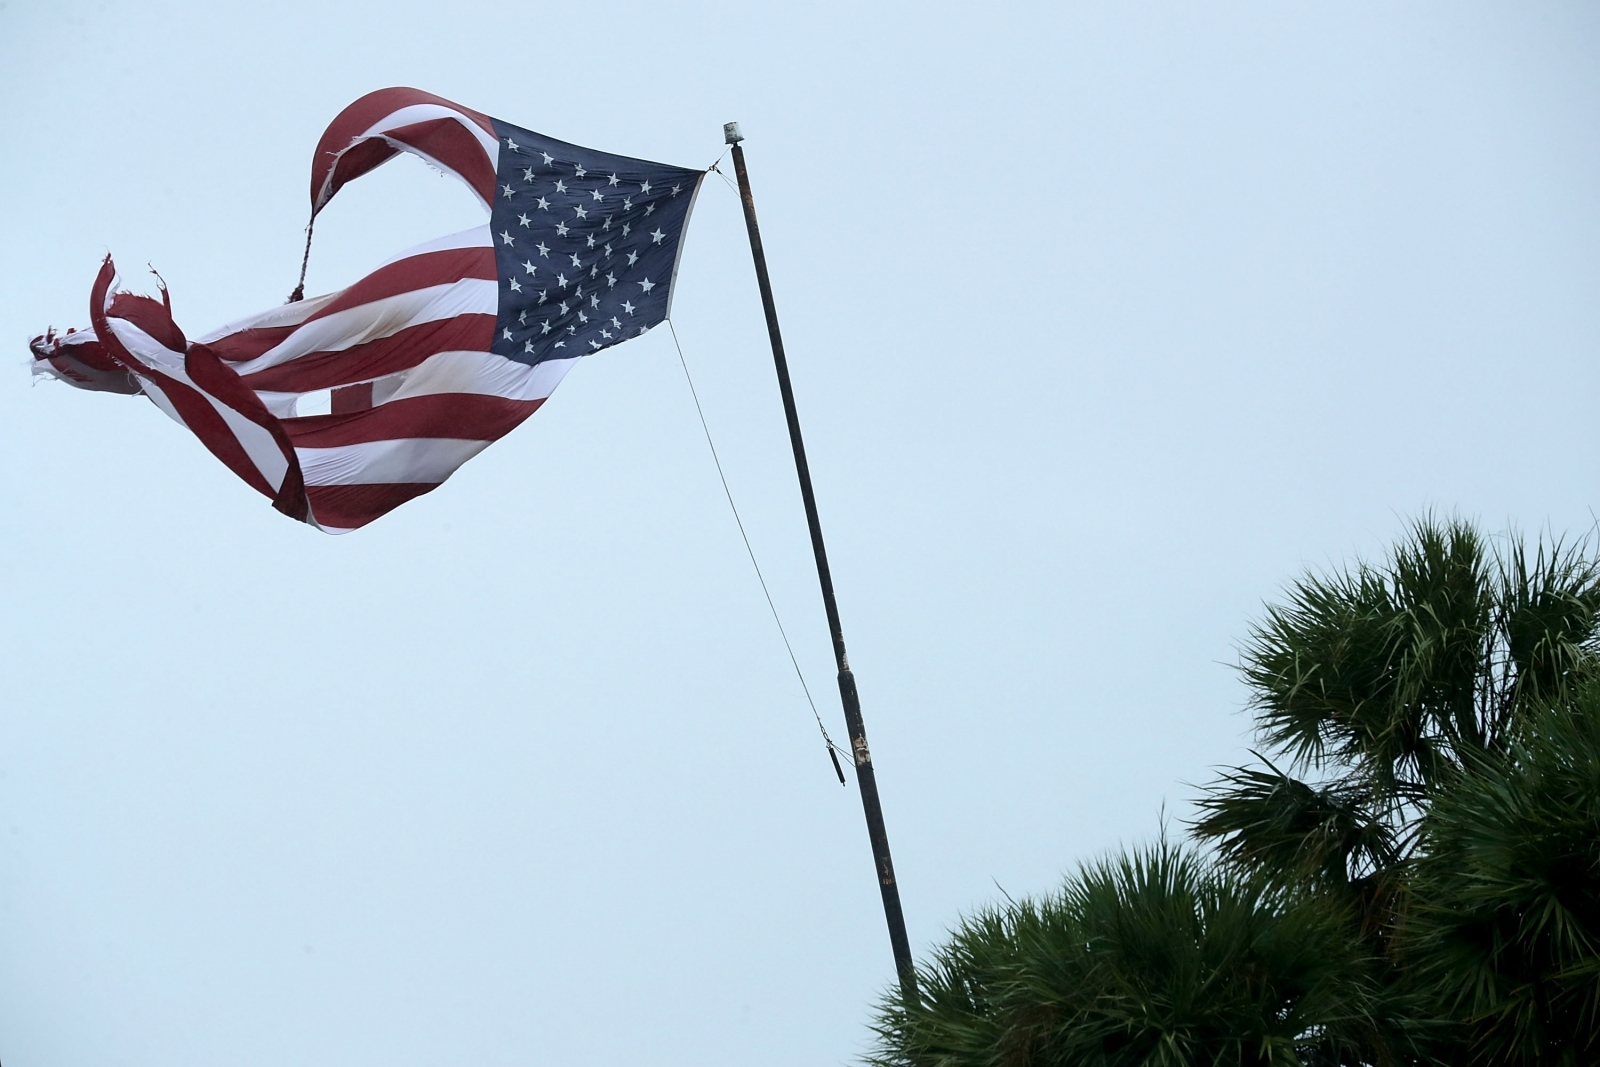 US flag ripped by Hurricane Irma